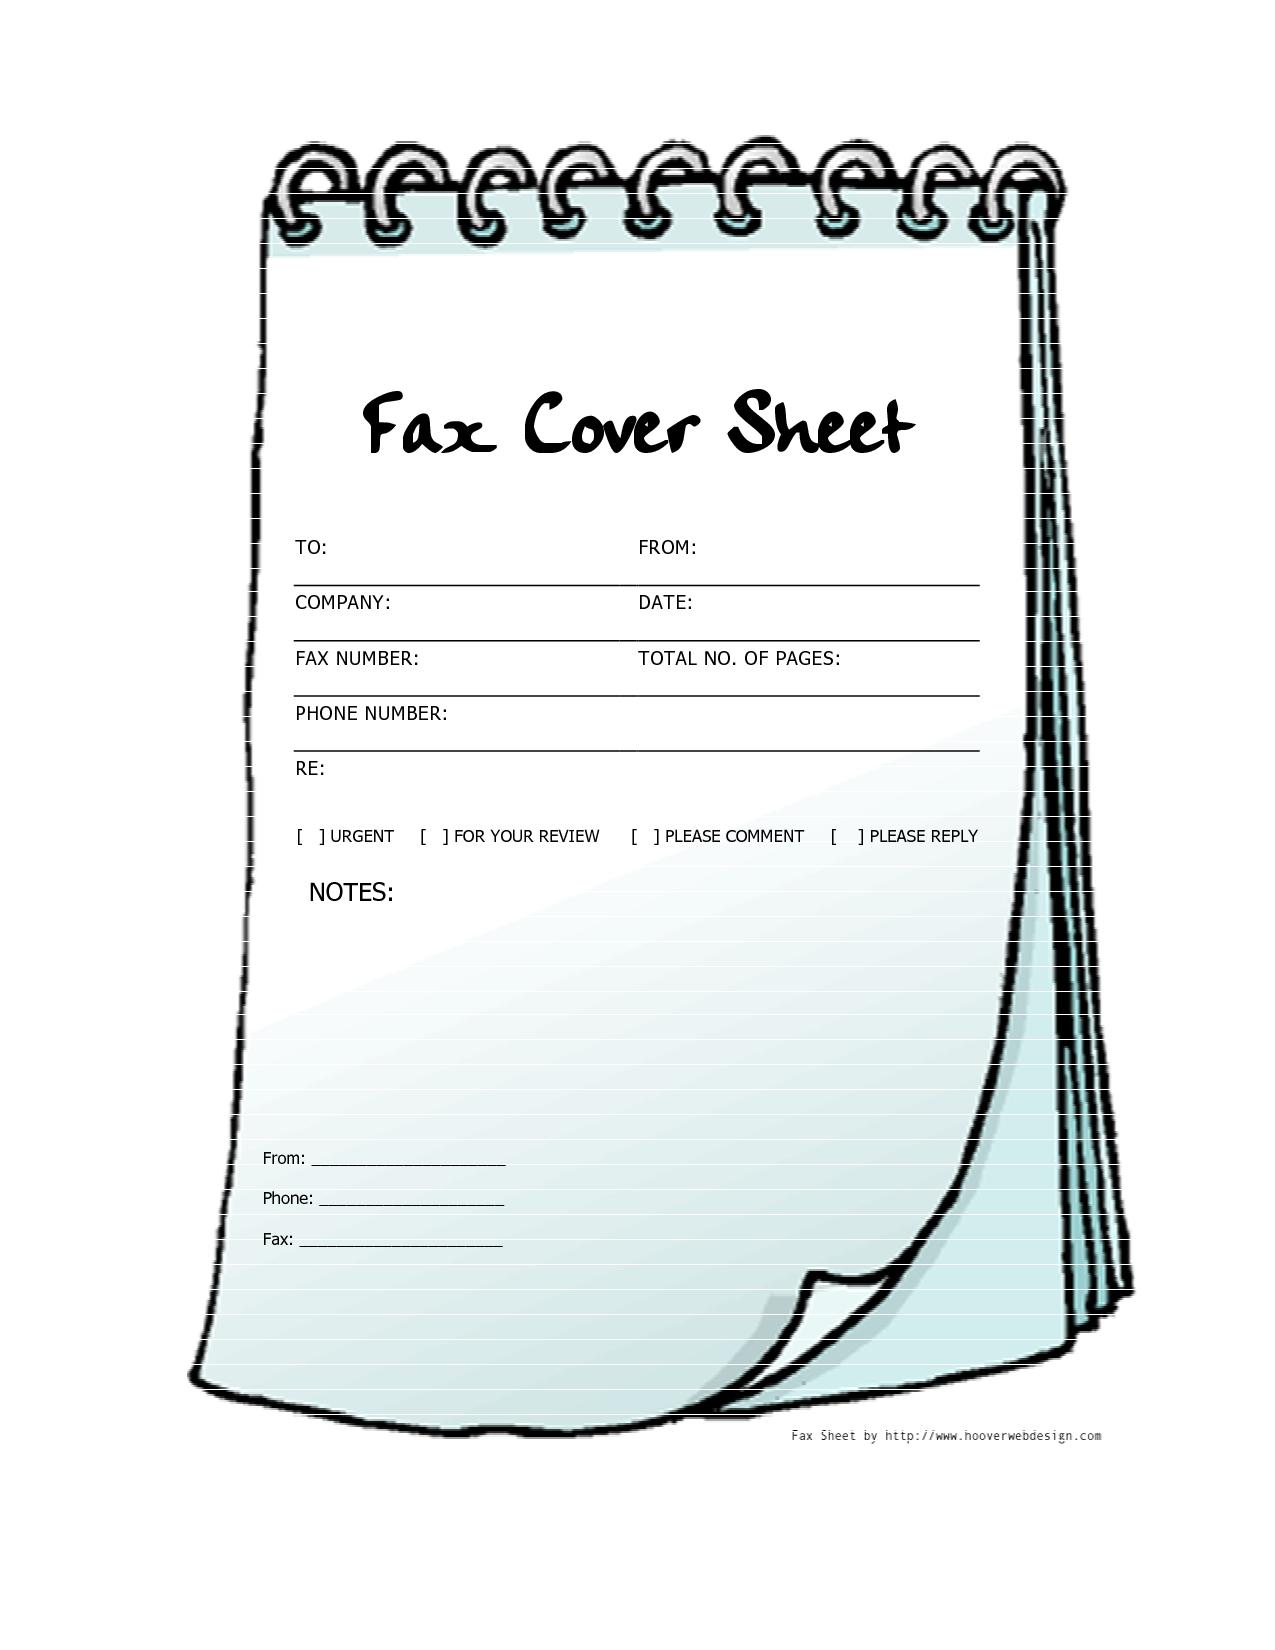 Free Printable Fax Cover Sheets   Free Printable Fax Cover Sheet - Free Printable Fax Cover Sheet